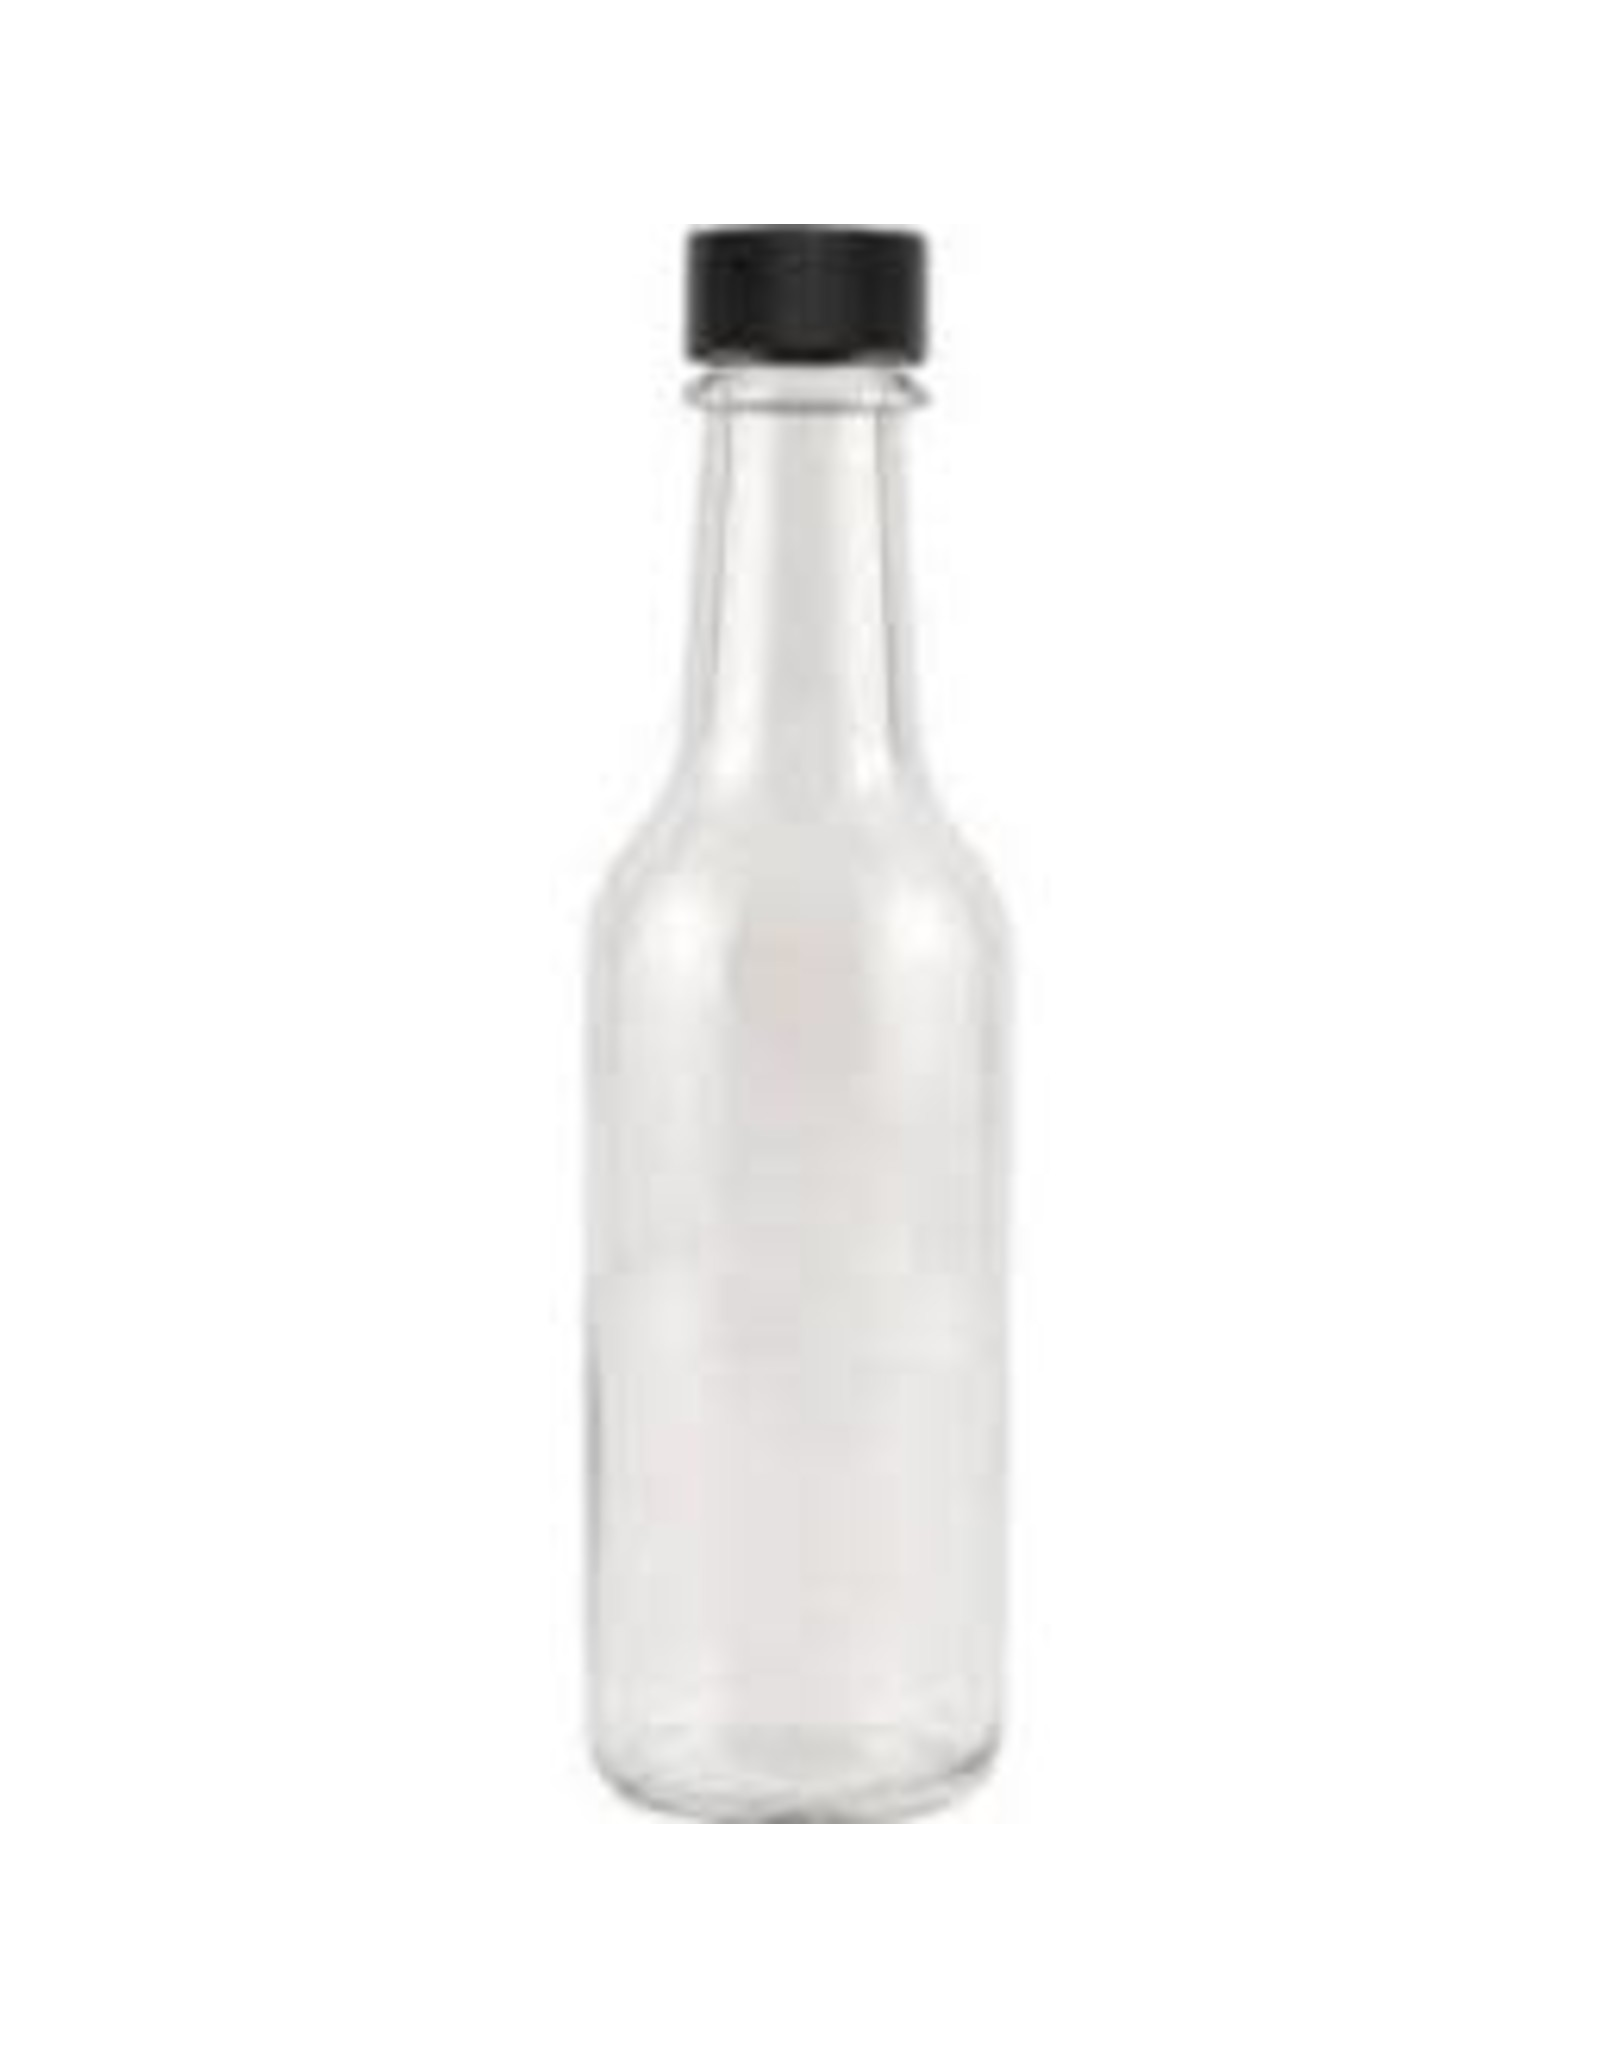 5oz Woozy Bottles Hot Sauce Kit With Shrinks (Case of 12)